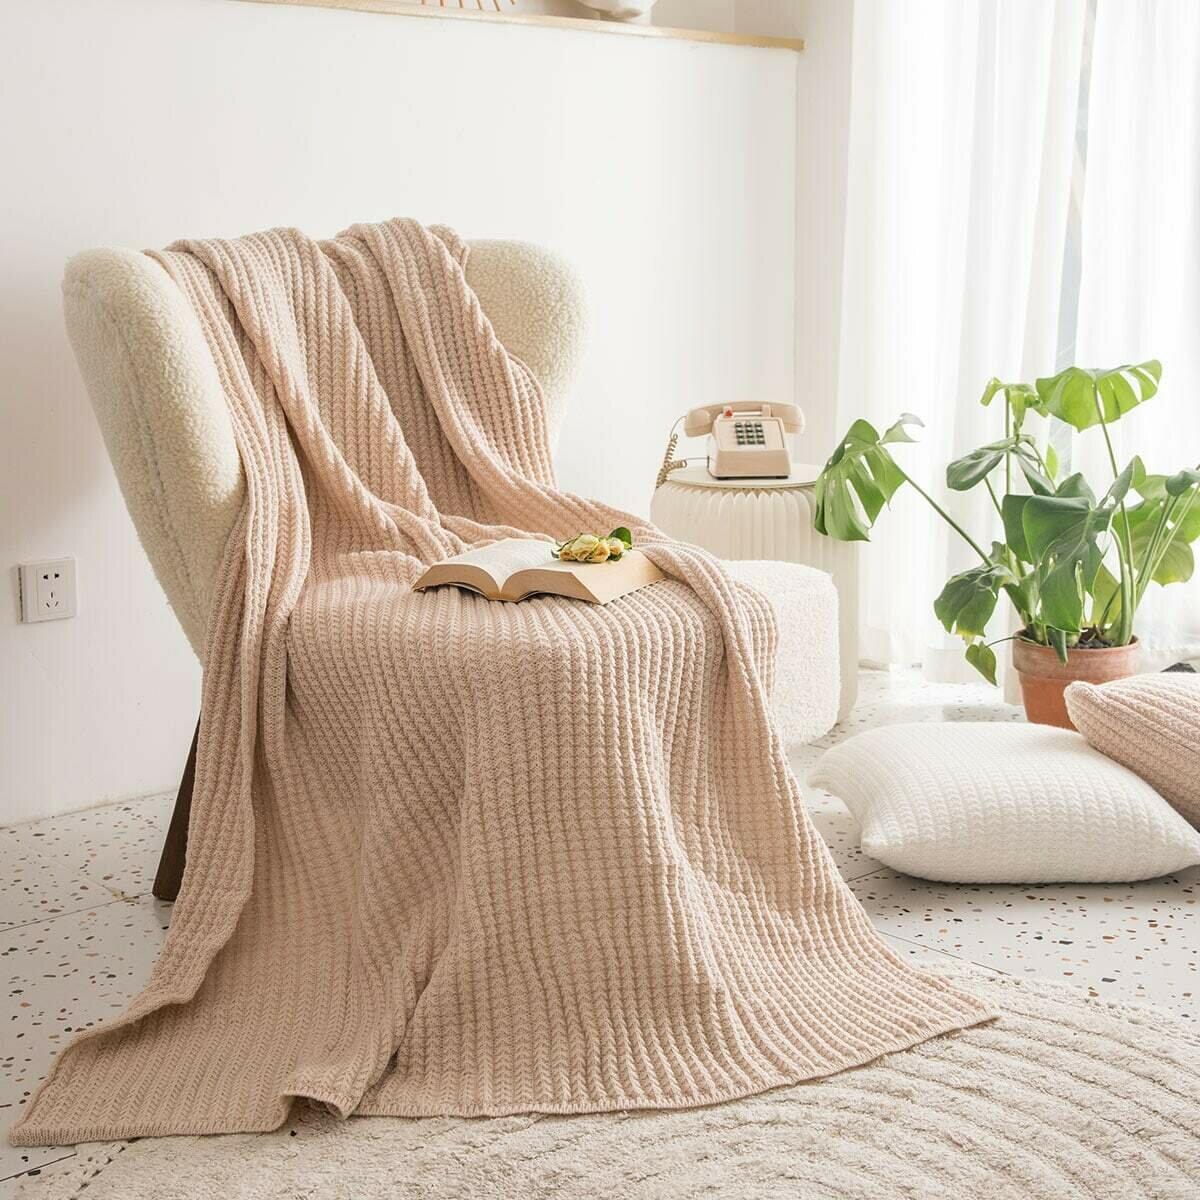 Однотонное вязаное одеяло